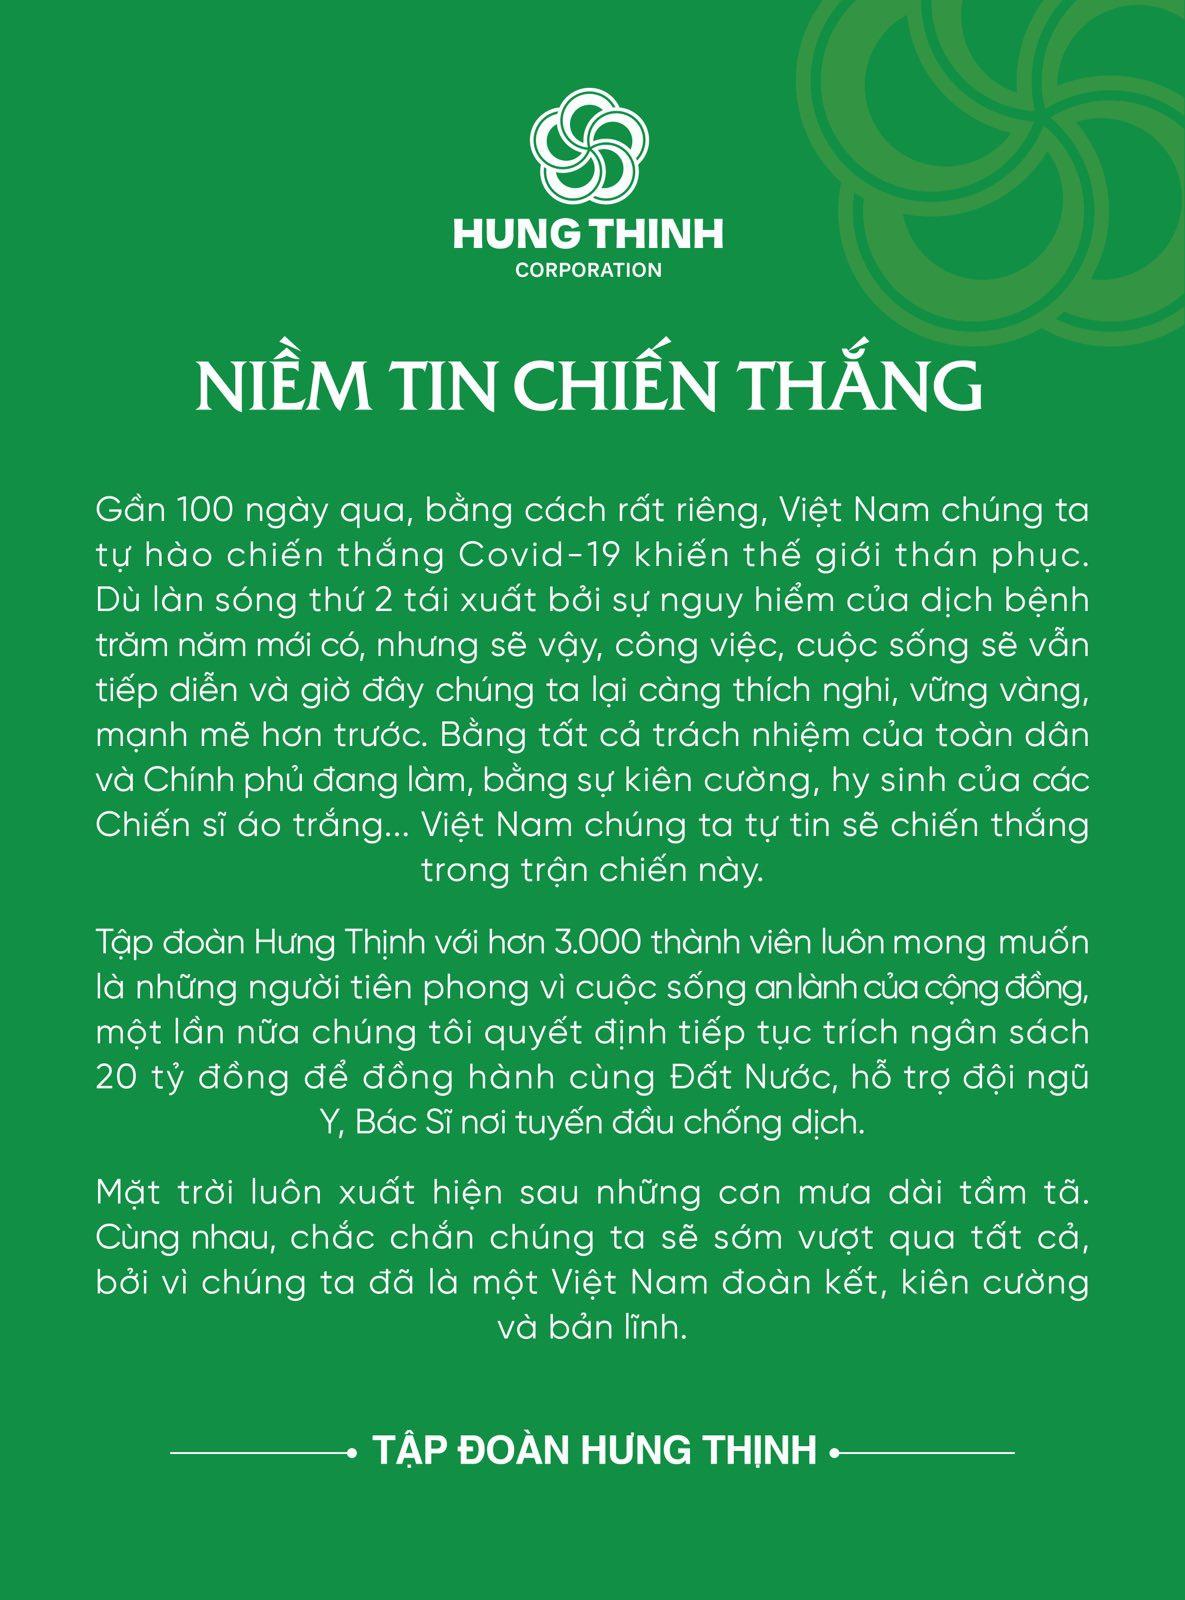 H1.Hung Thinh tiep tuc trich ngan sach 20 ty dong ung ho phong chong  Covid-19